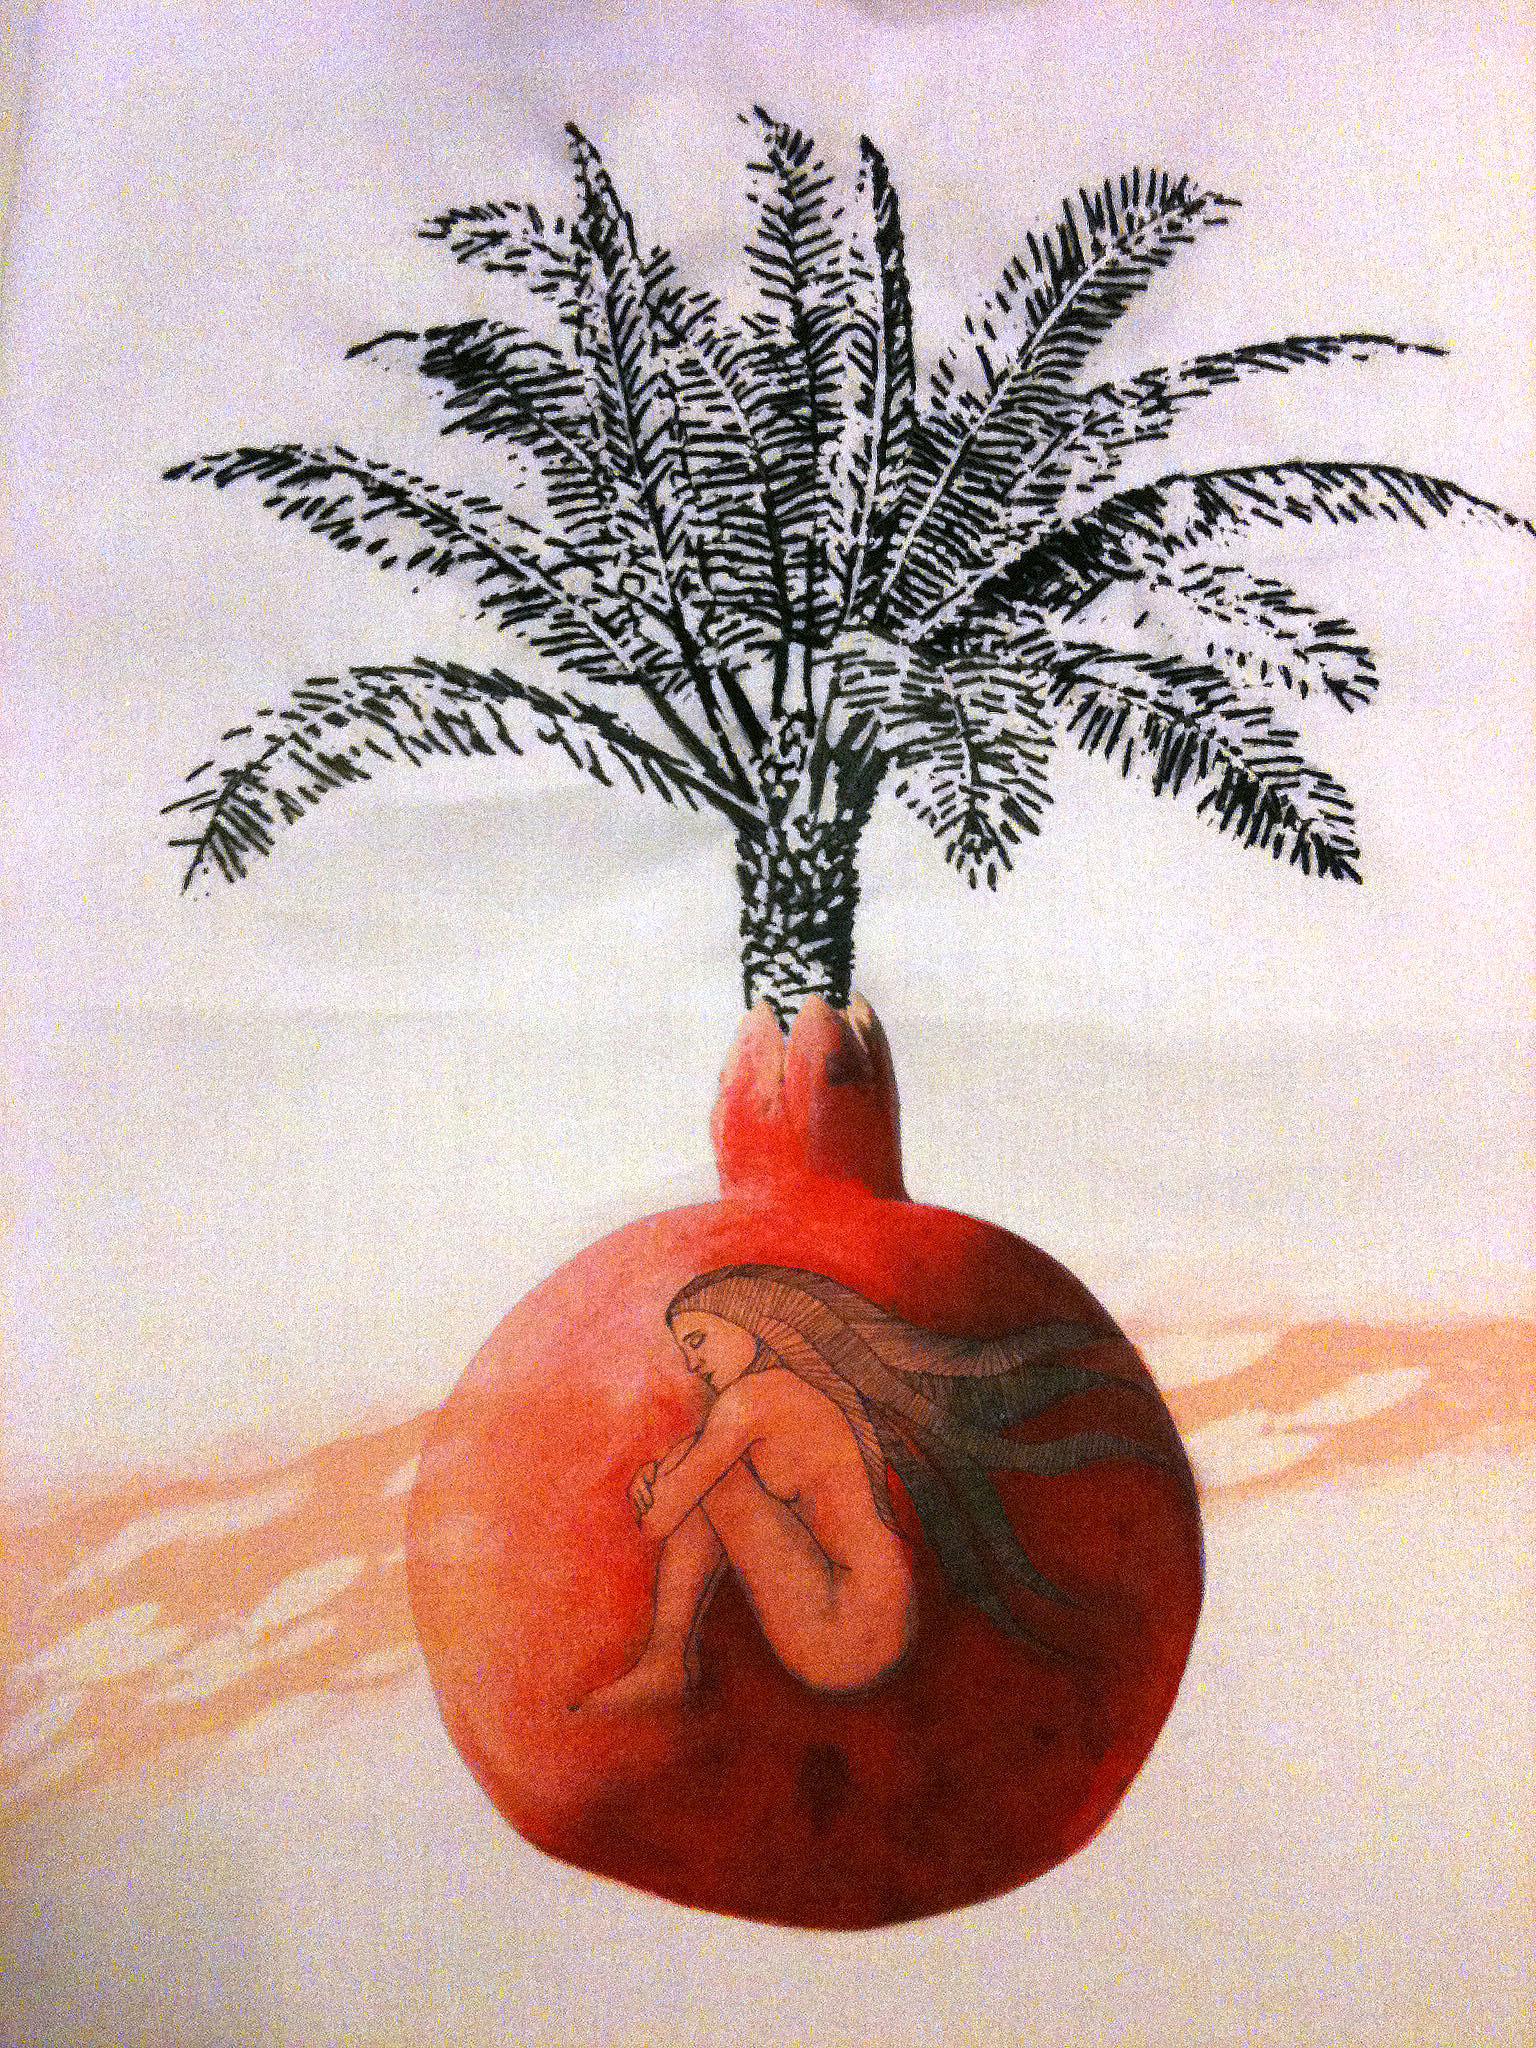 highres Women & Pomegranate & black niddle point.jpg